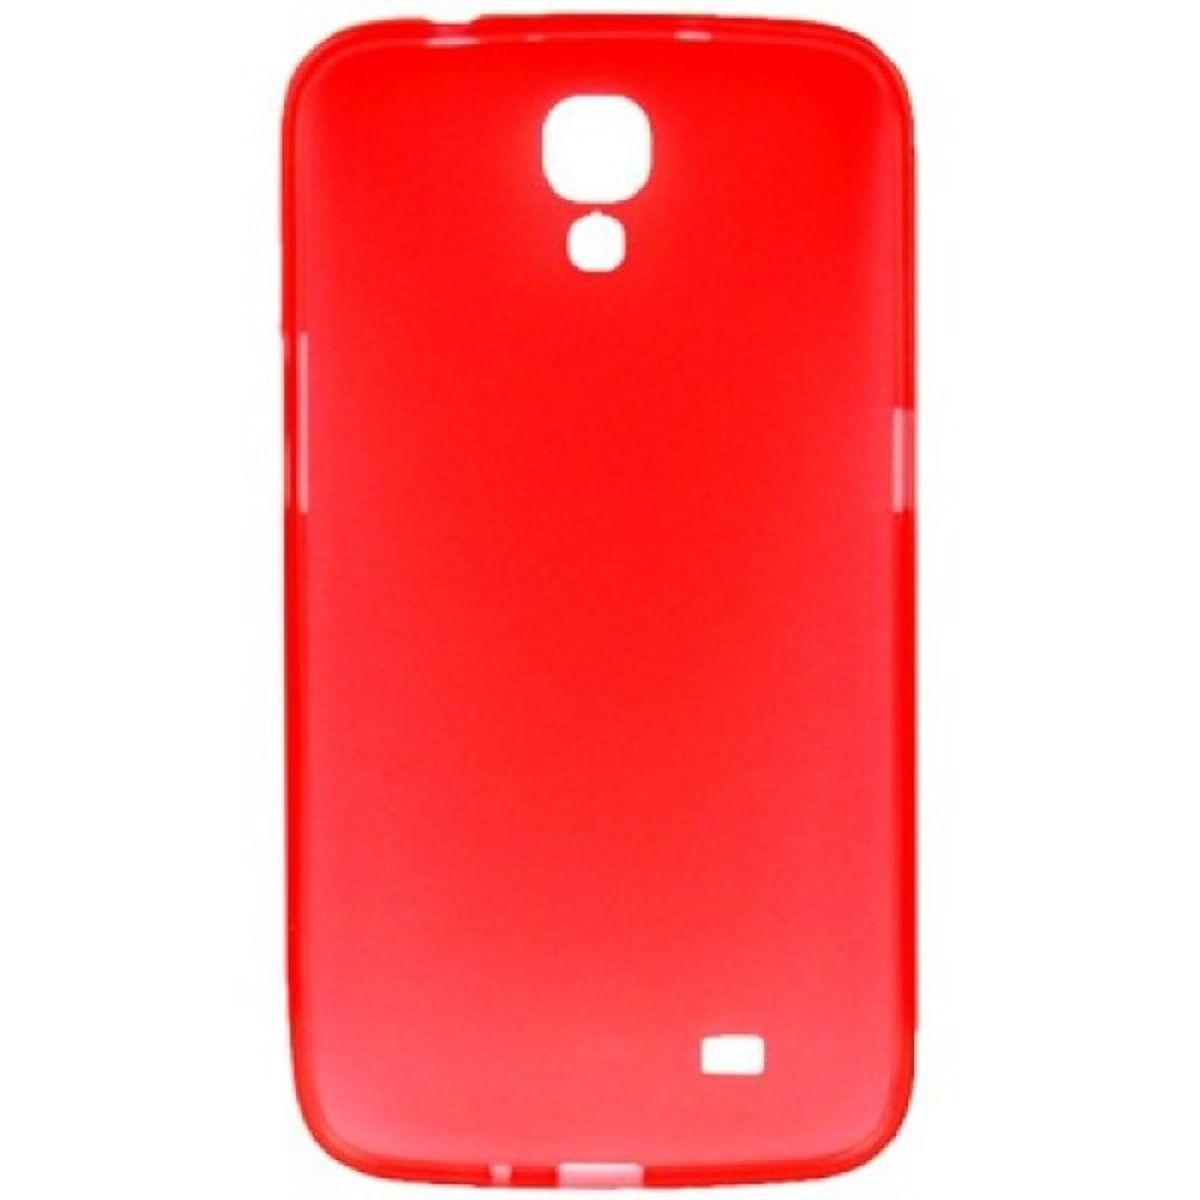 Schutzhülle TPU für Handy Samsung Galaxy Mega 6.3 i9200 & i9205